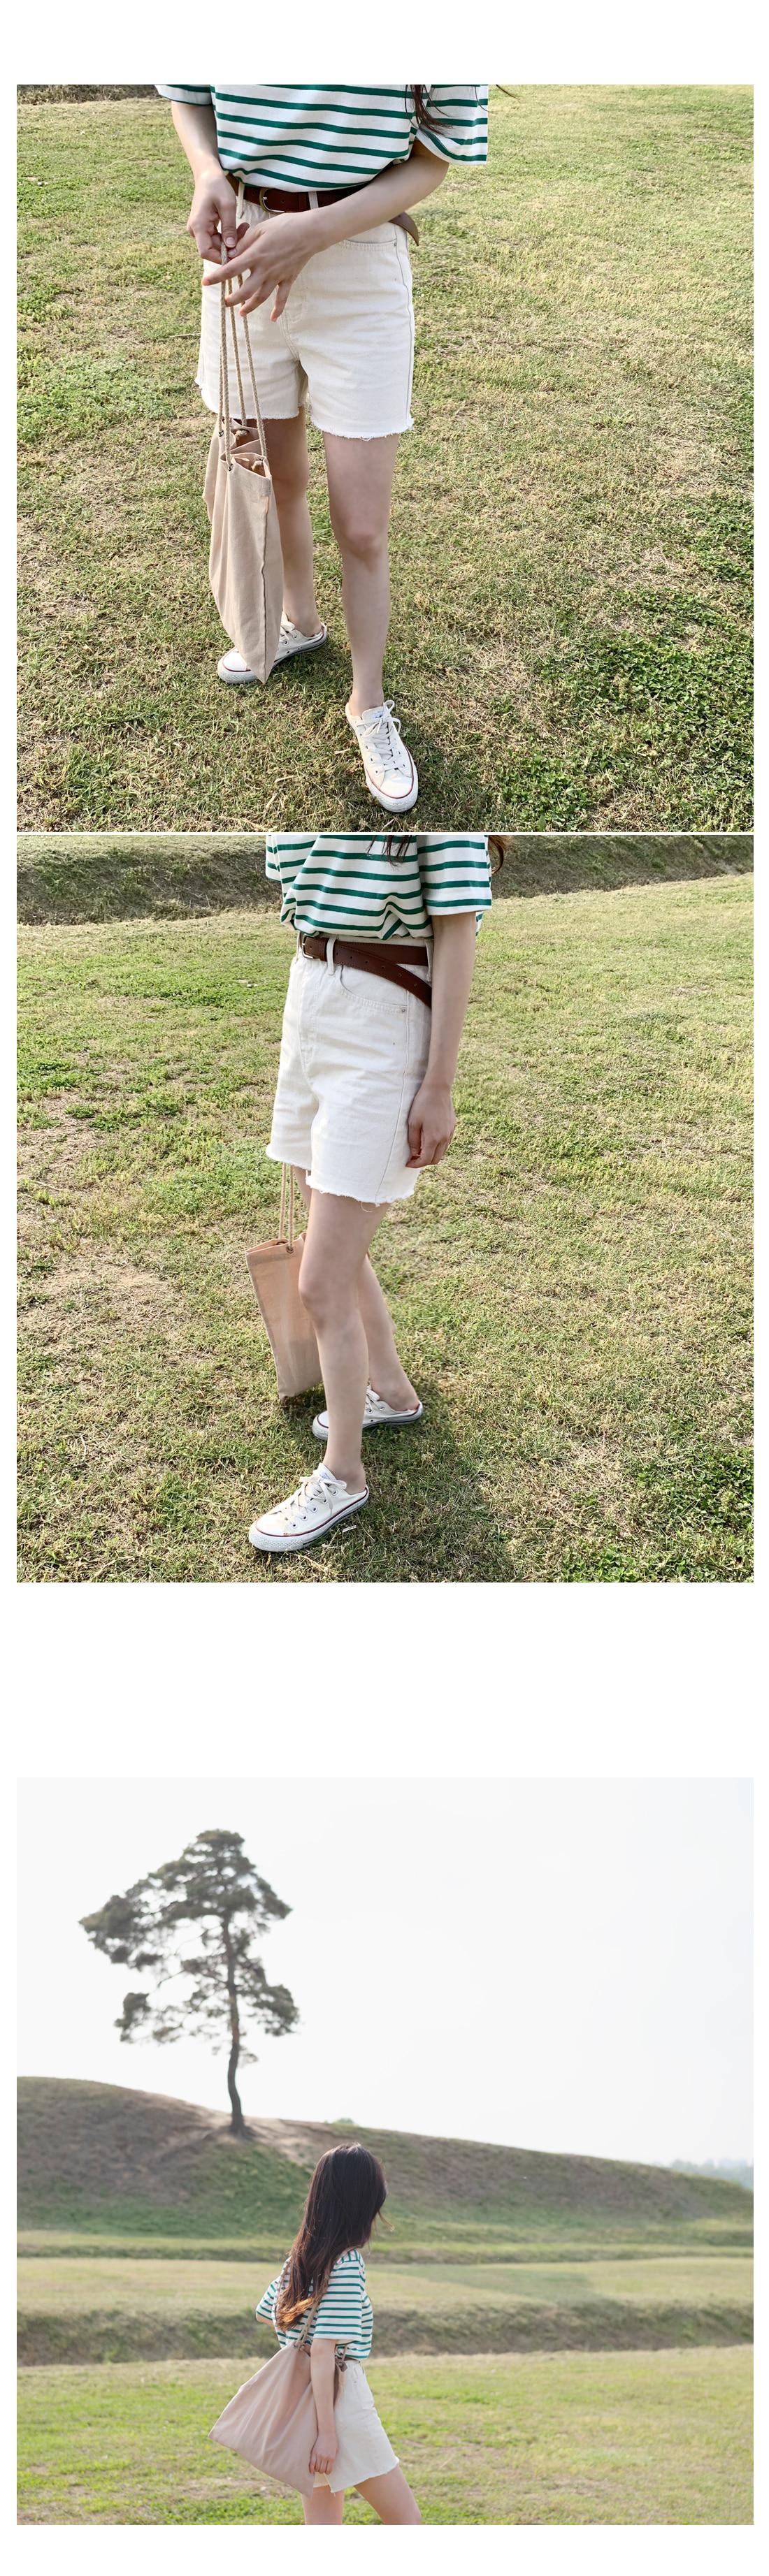 High cotton shorts